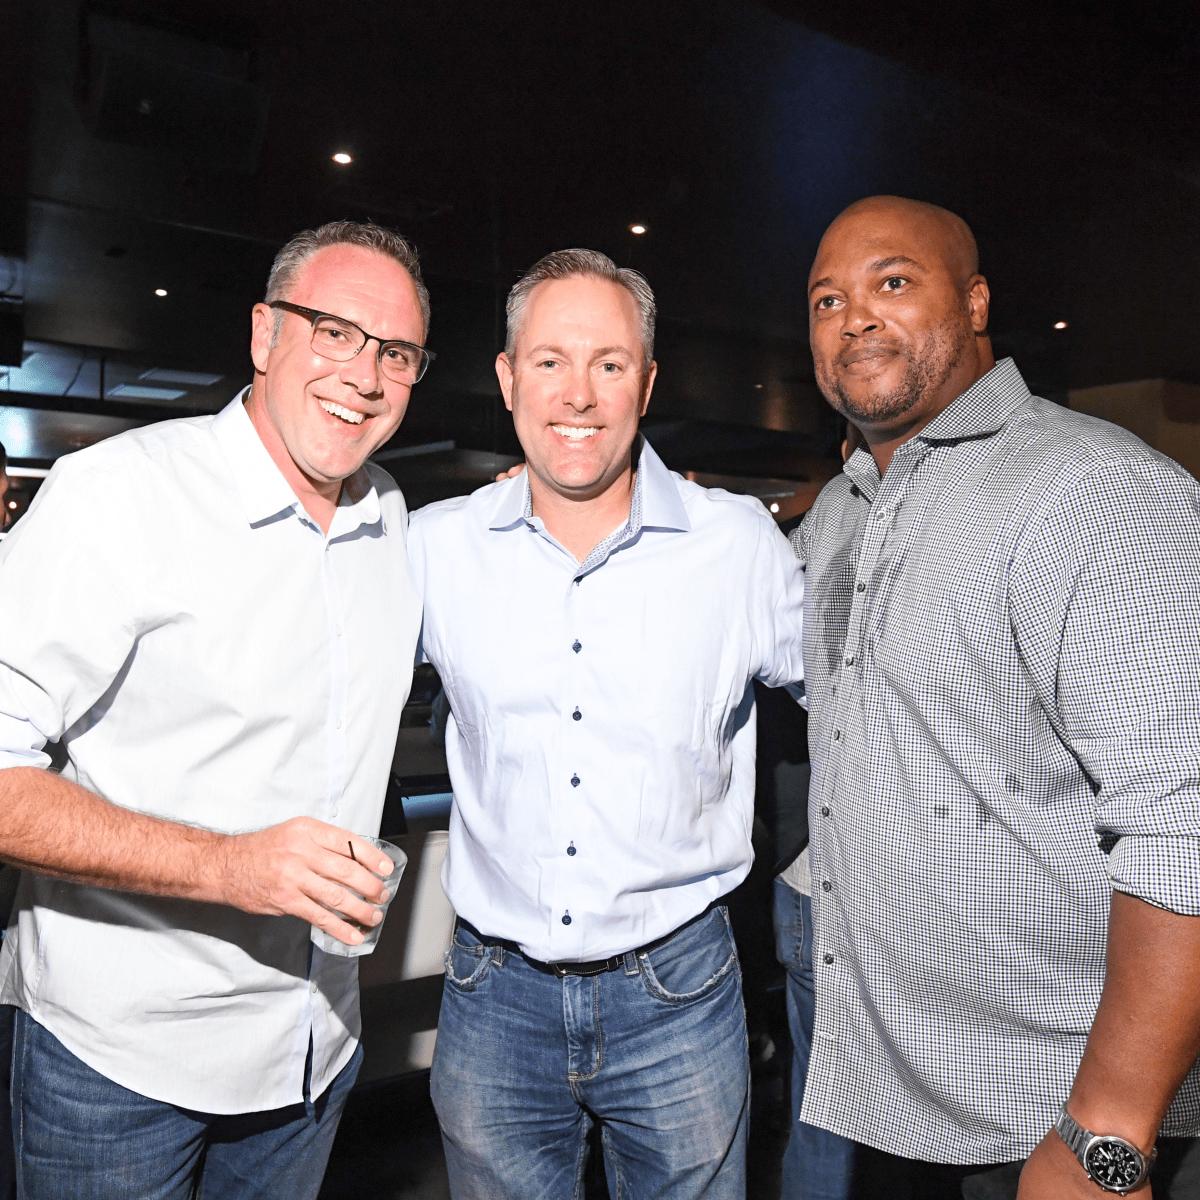 Houston, George Spring Bowling Event, June 2016, Lance Zierlein, Reid Ryan, Kenny Felder